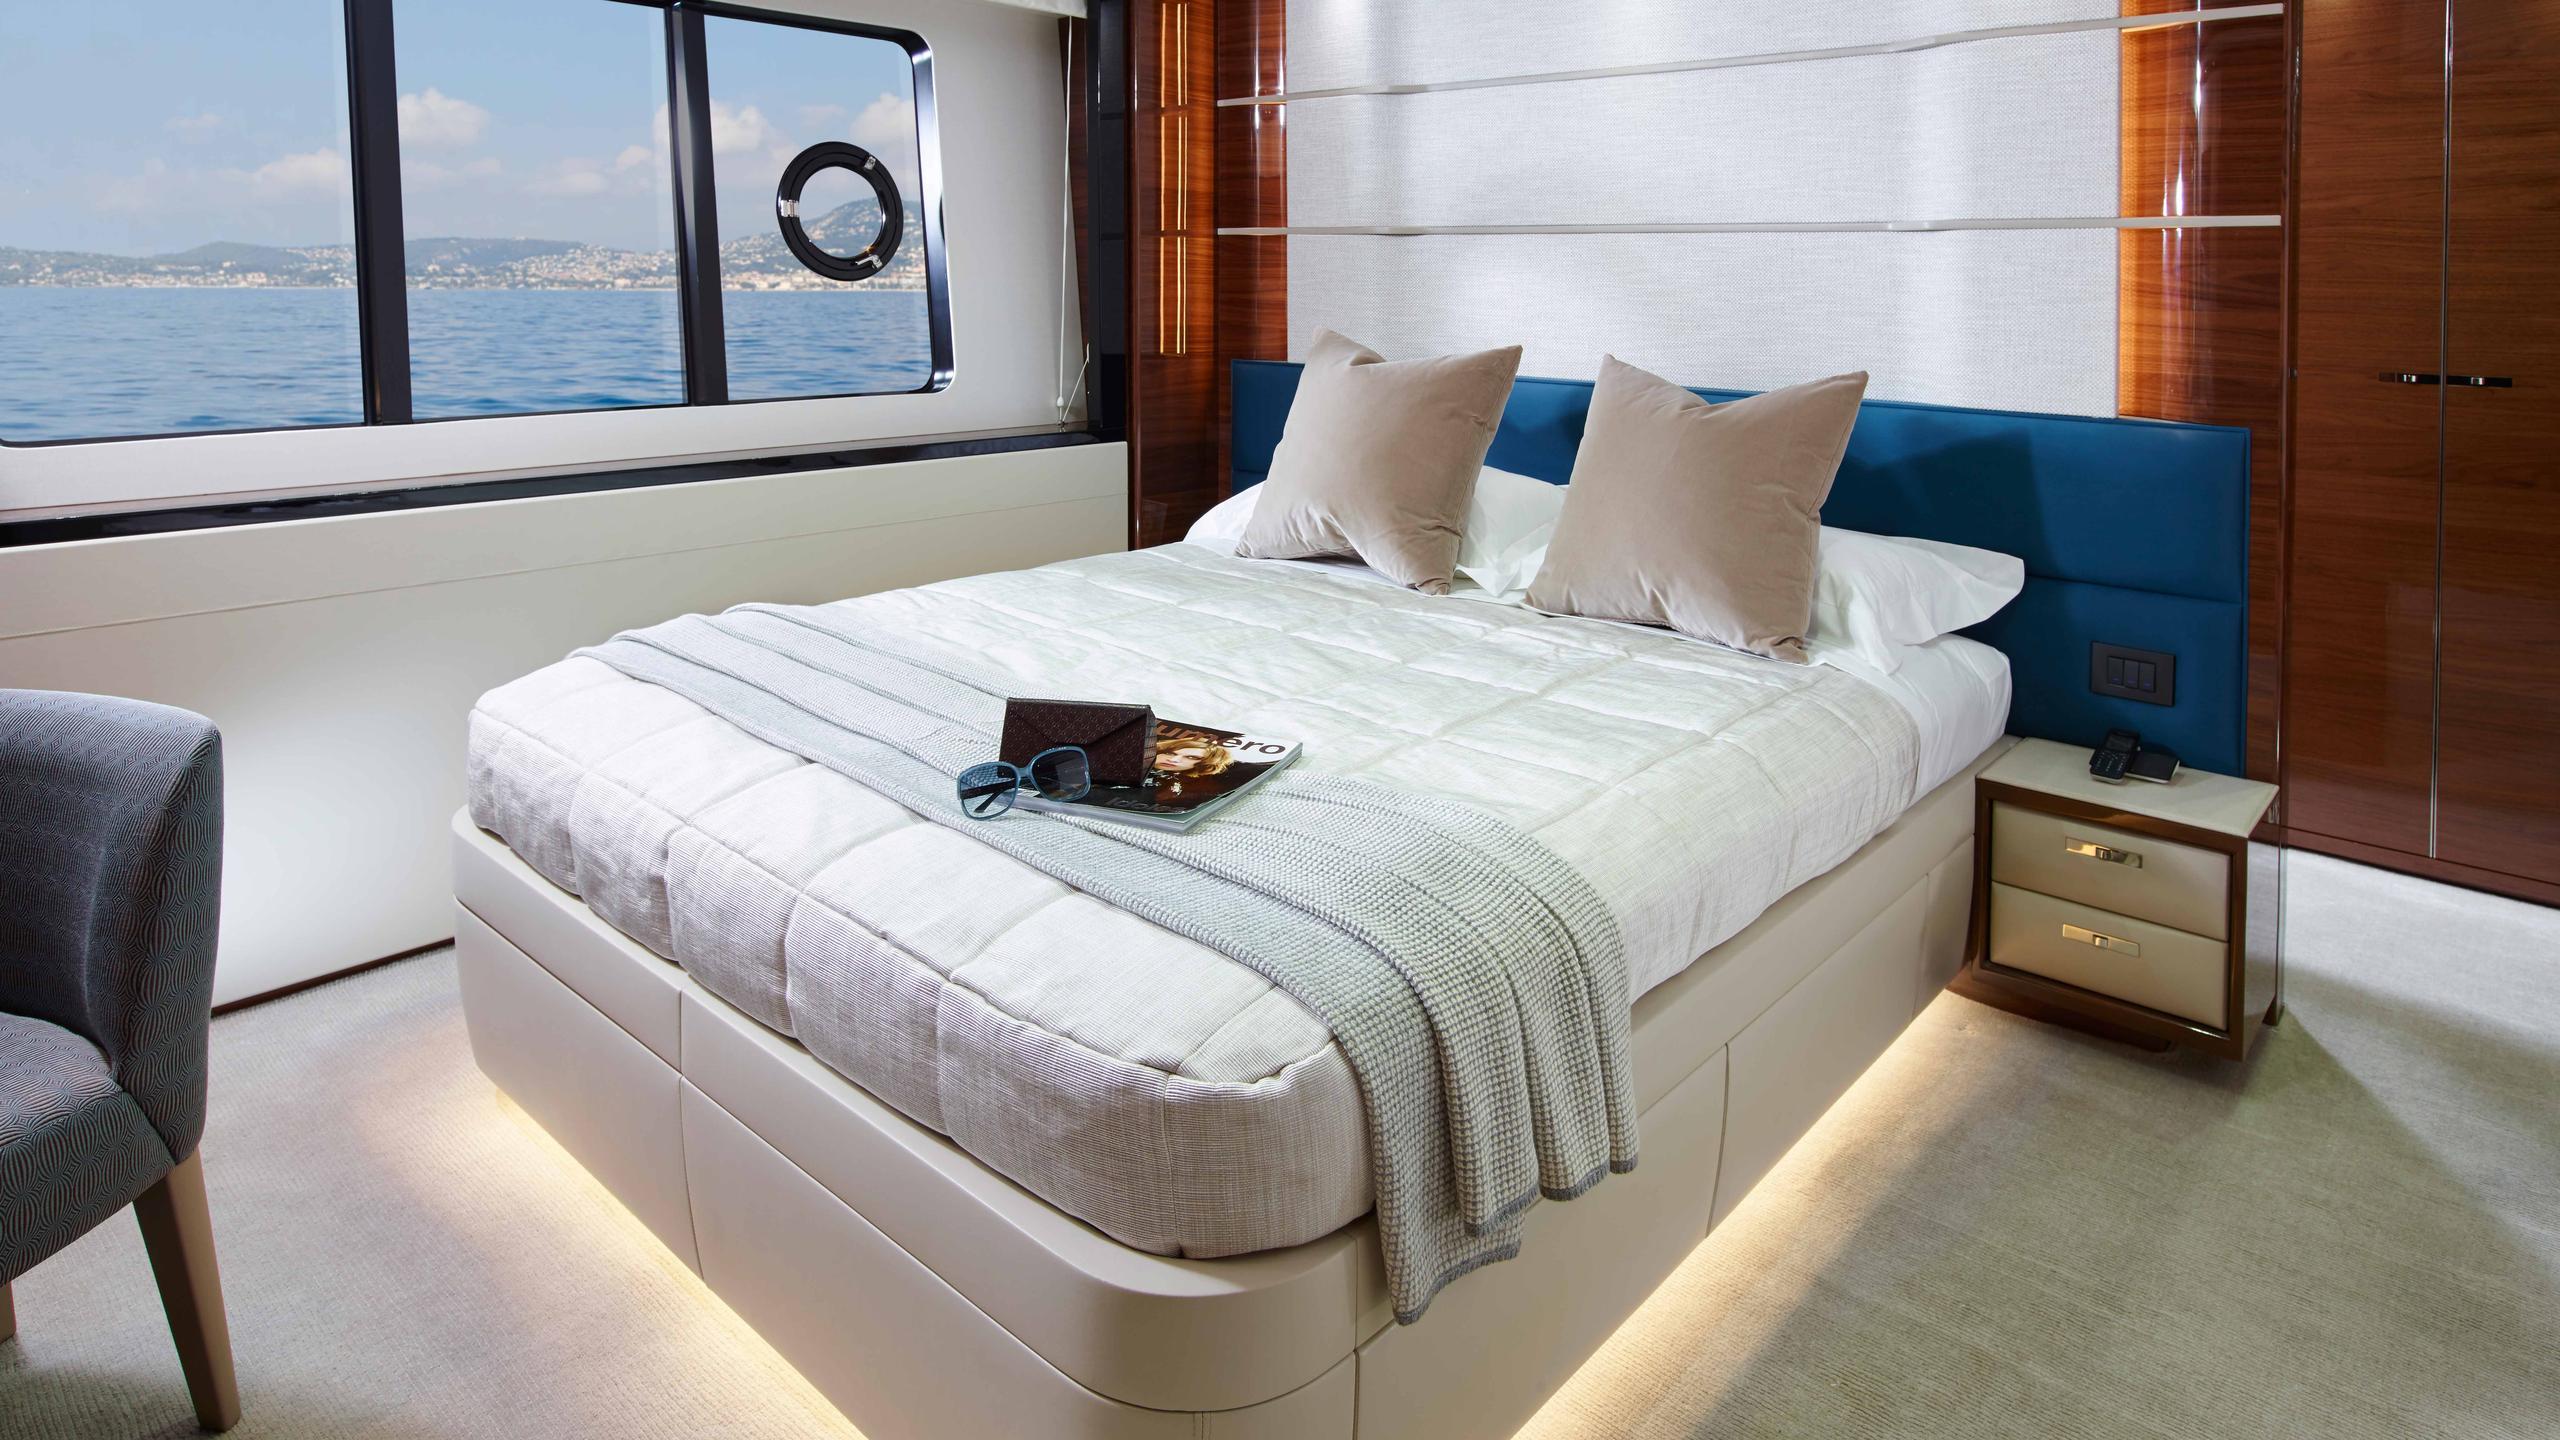 kohuba-motor-yacht-princess-2016-30m-double